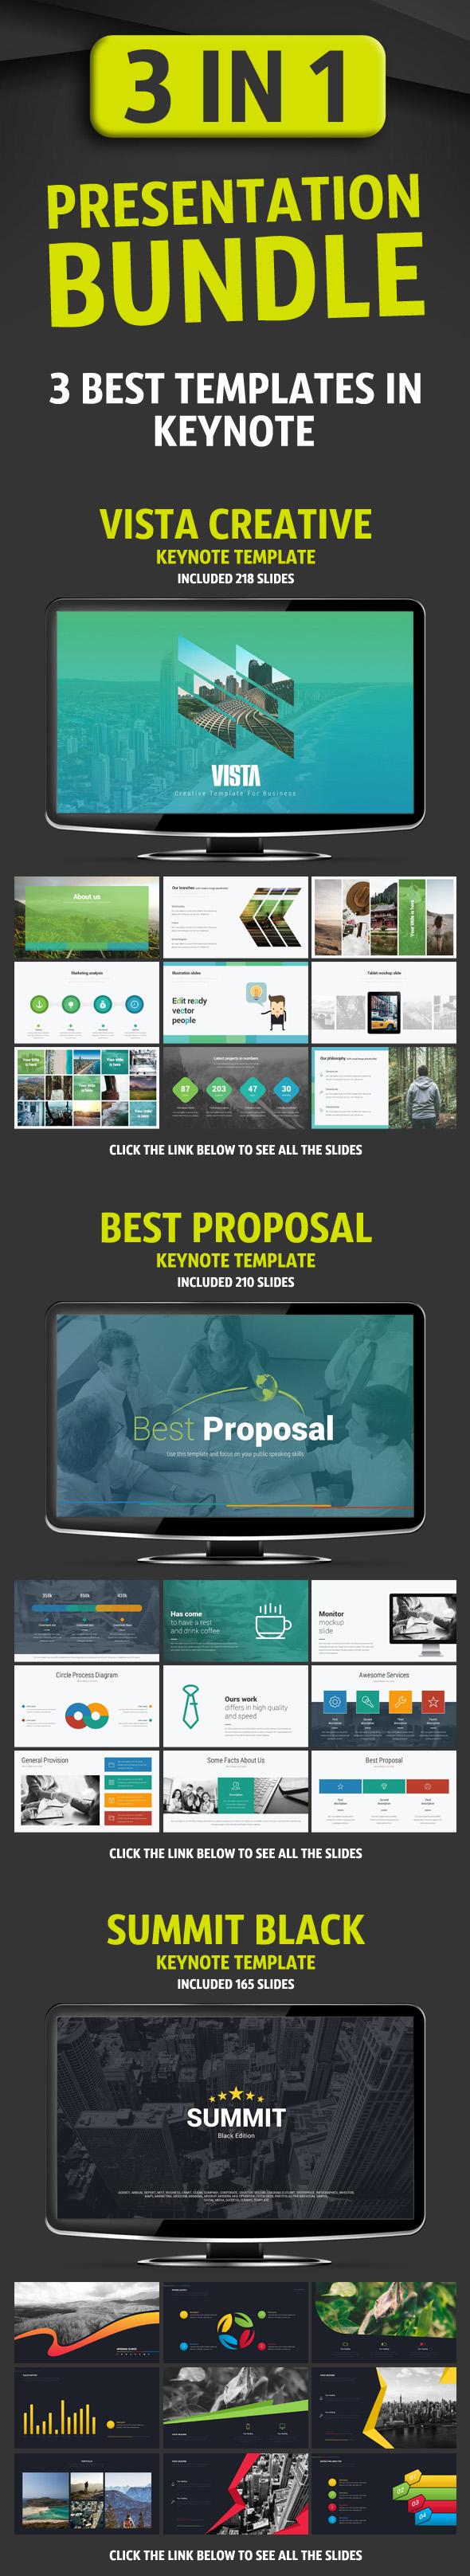 Presentation Bundle - Business Keynote Templates